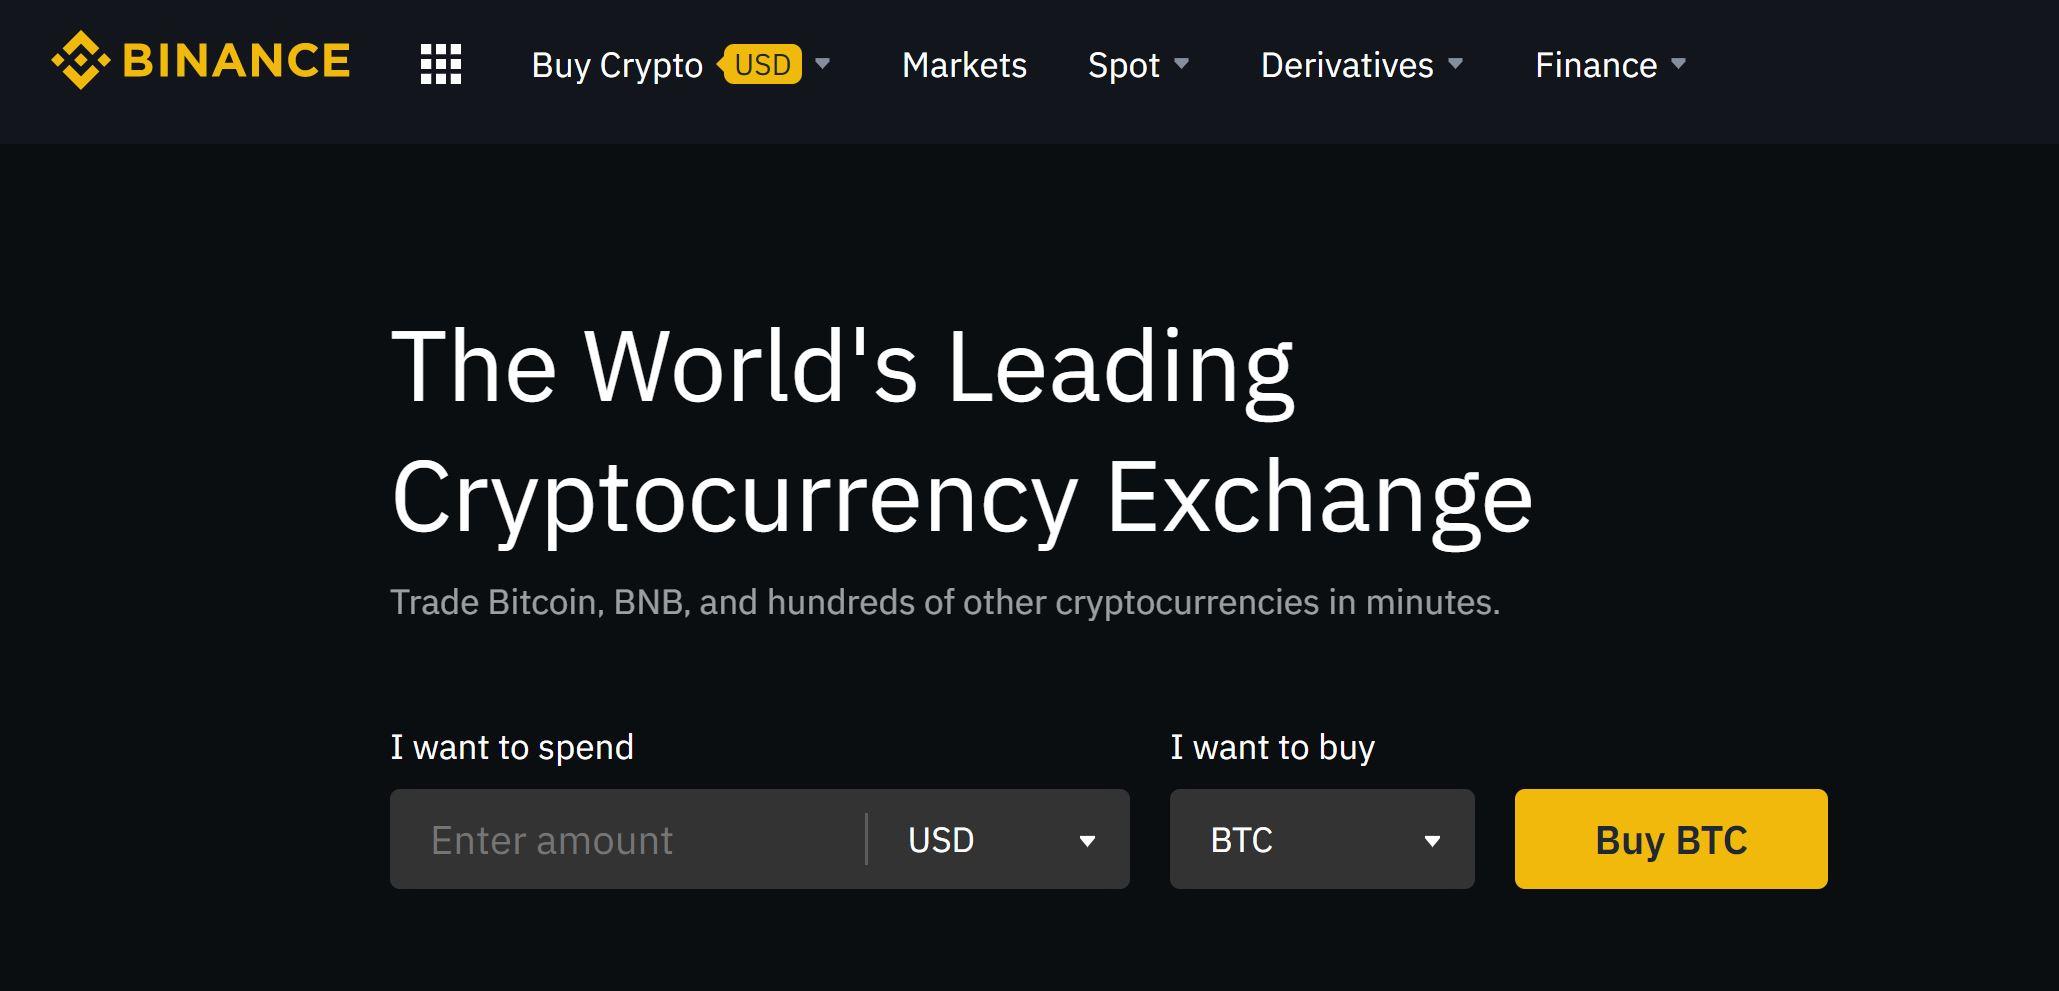 geriausia cryptocurrency trading platforma uk